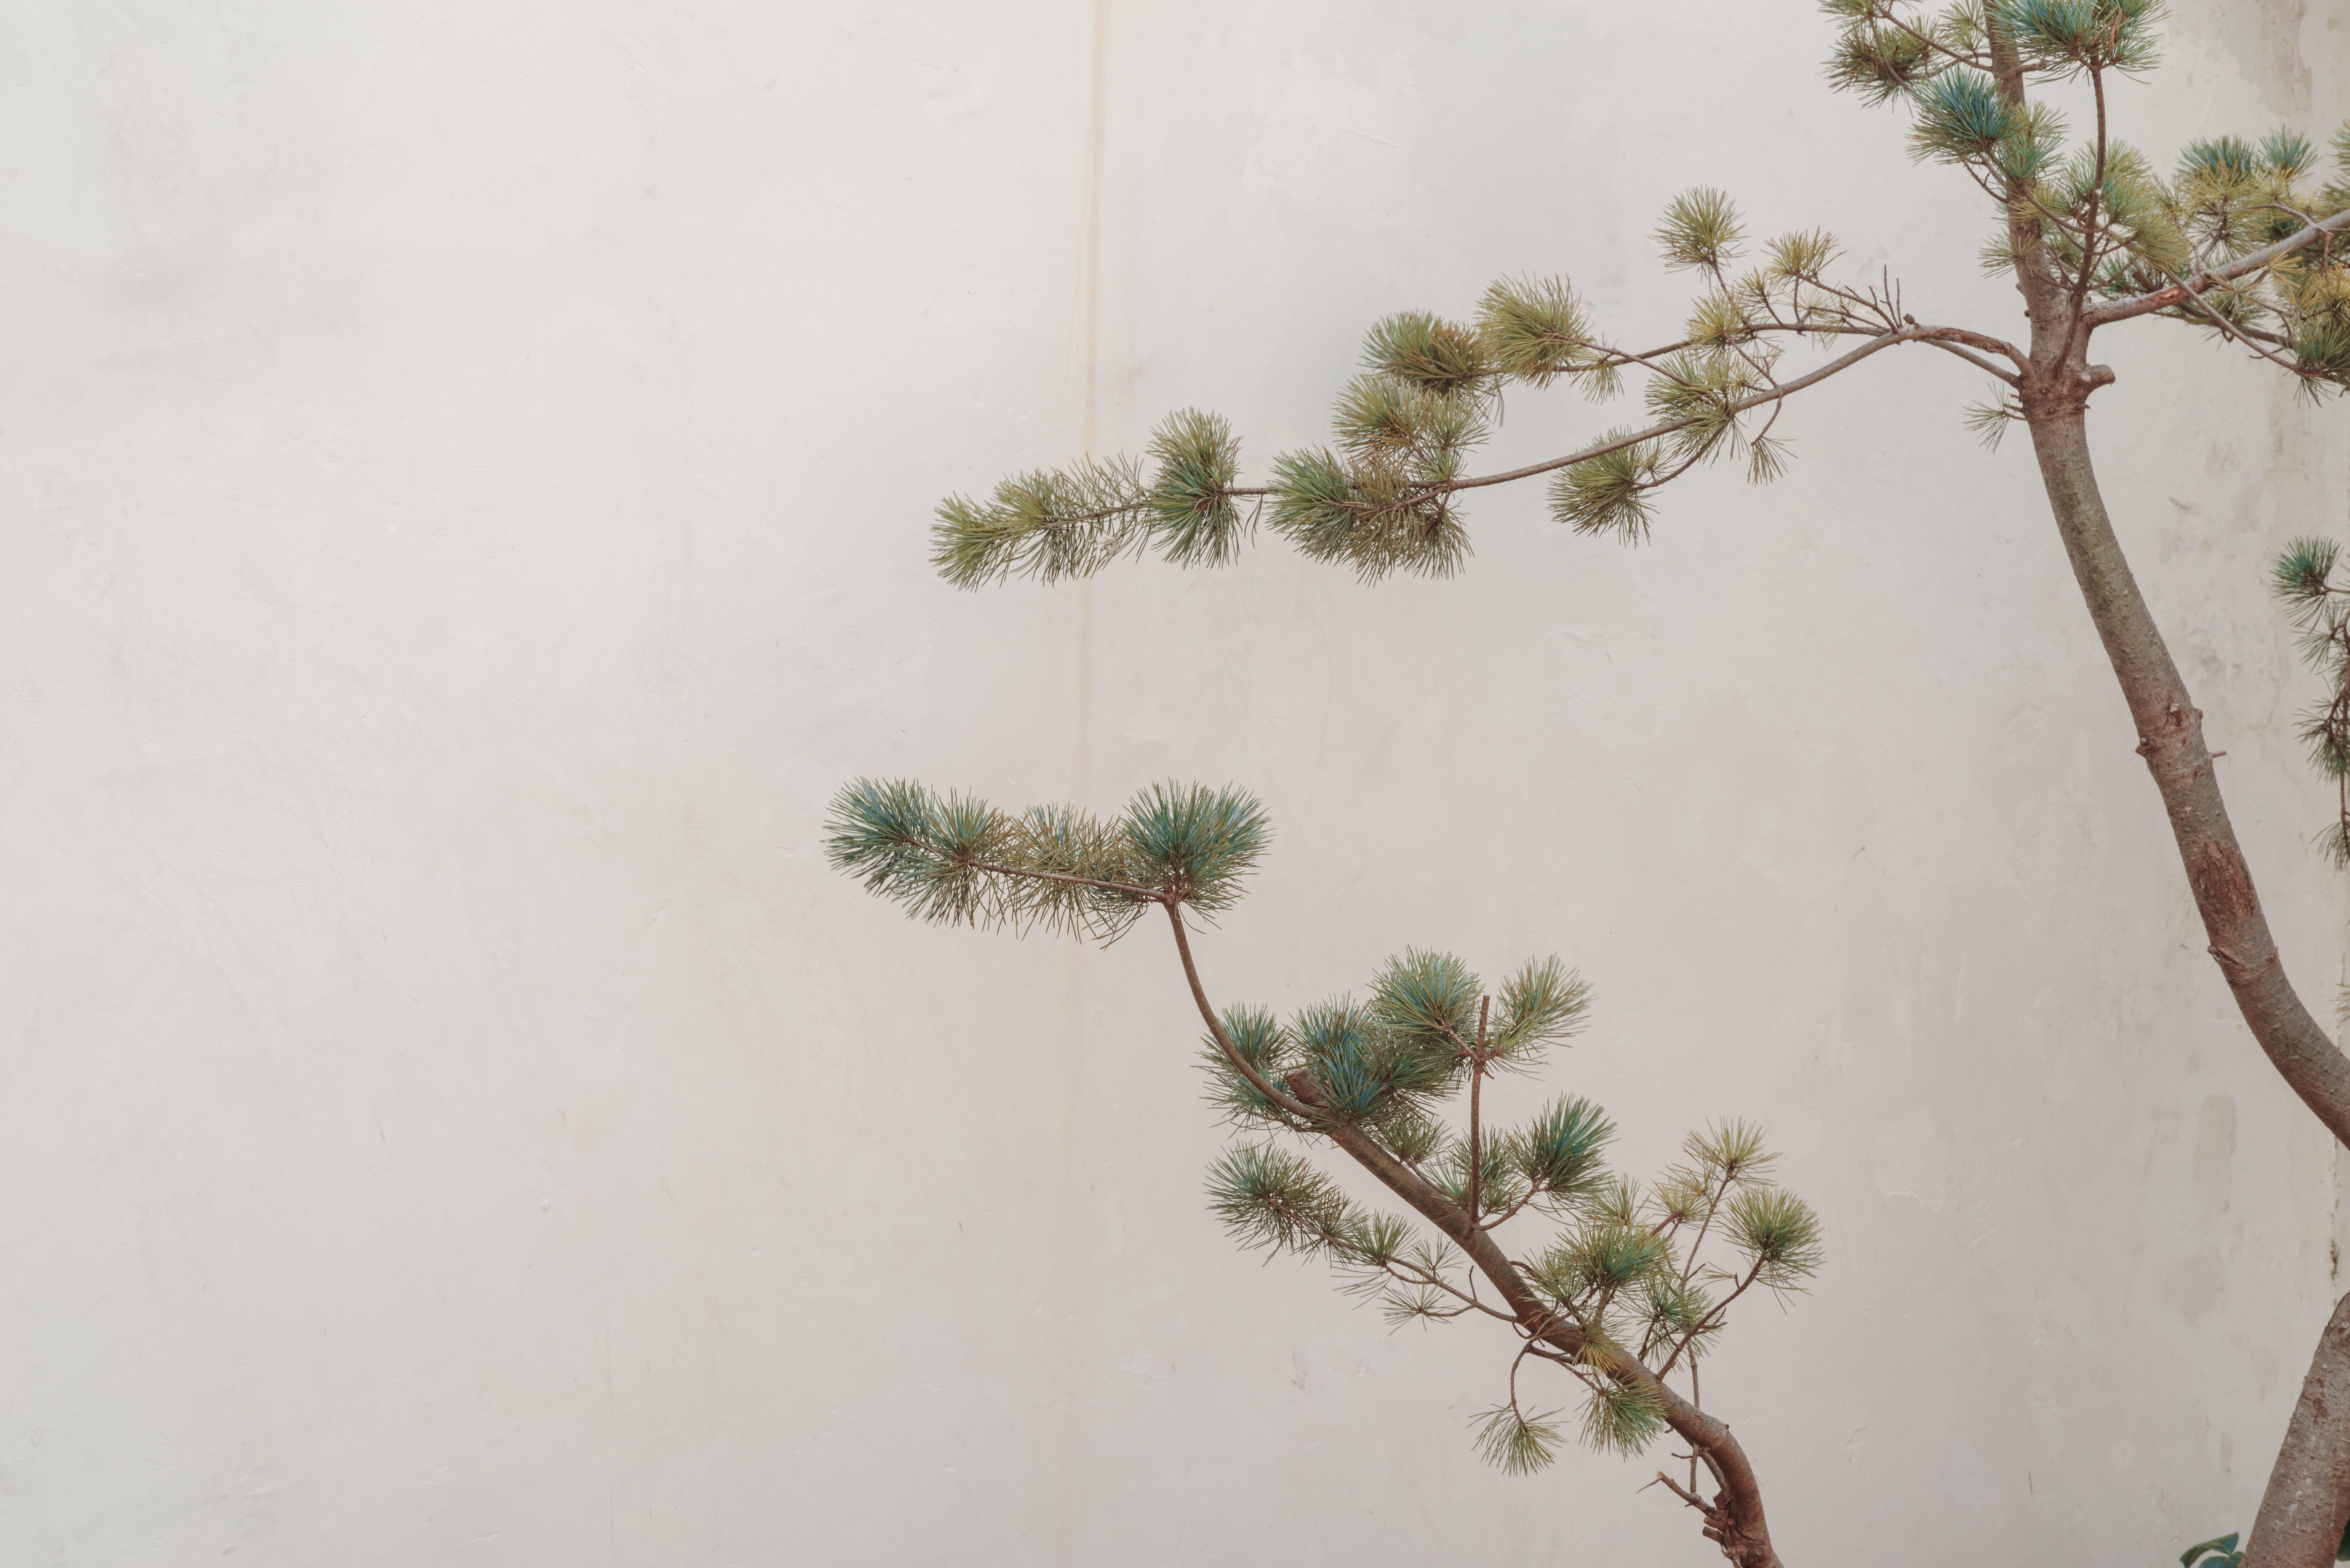 green tree beside white wall